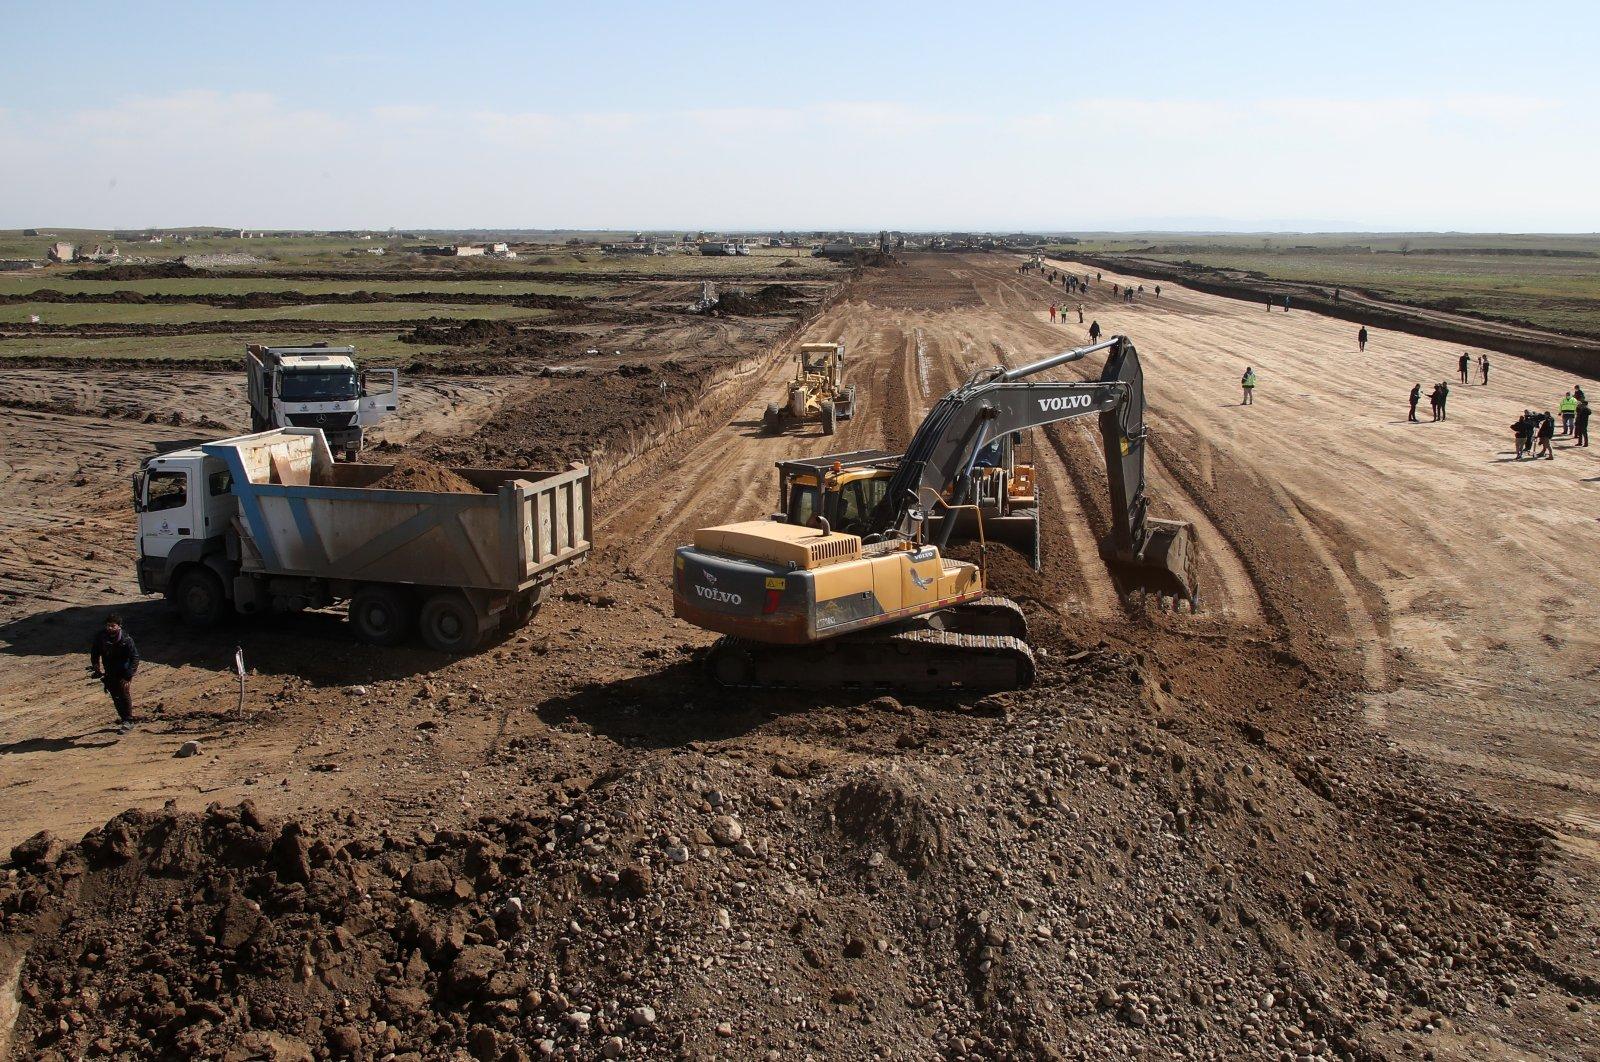 The construction site of a runway at Fuzuli International Airport, Fuzuli district, Nagorno-Karabakh, Azerbaijan, Feb. 27, 2021. (Photo by Getty Images)